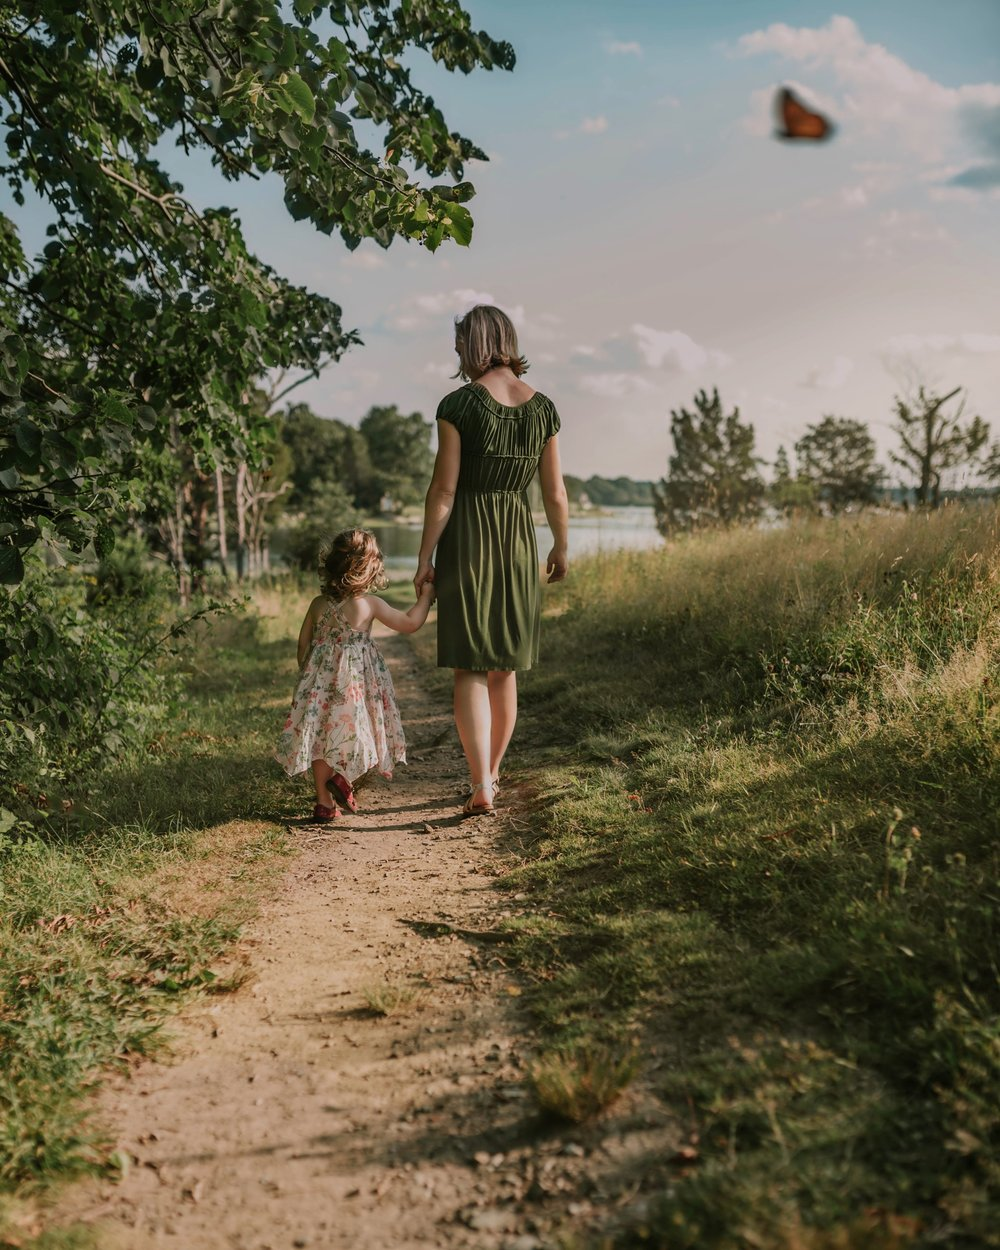 Summers_August_2018-43_Beautiful_Natural_Portraits_by_Award_Winning_Boston_Massachusetts_Family_Portrait_Photographer_Asher_and_Oak_Photography.jpg